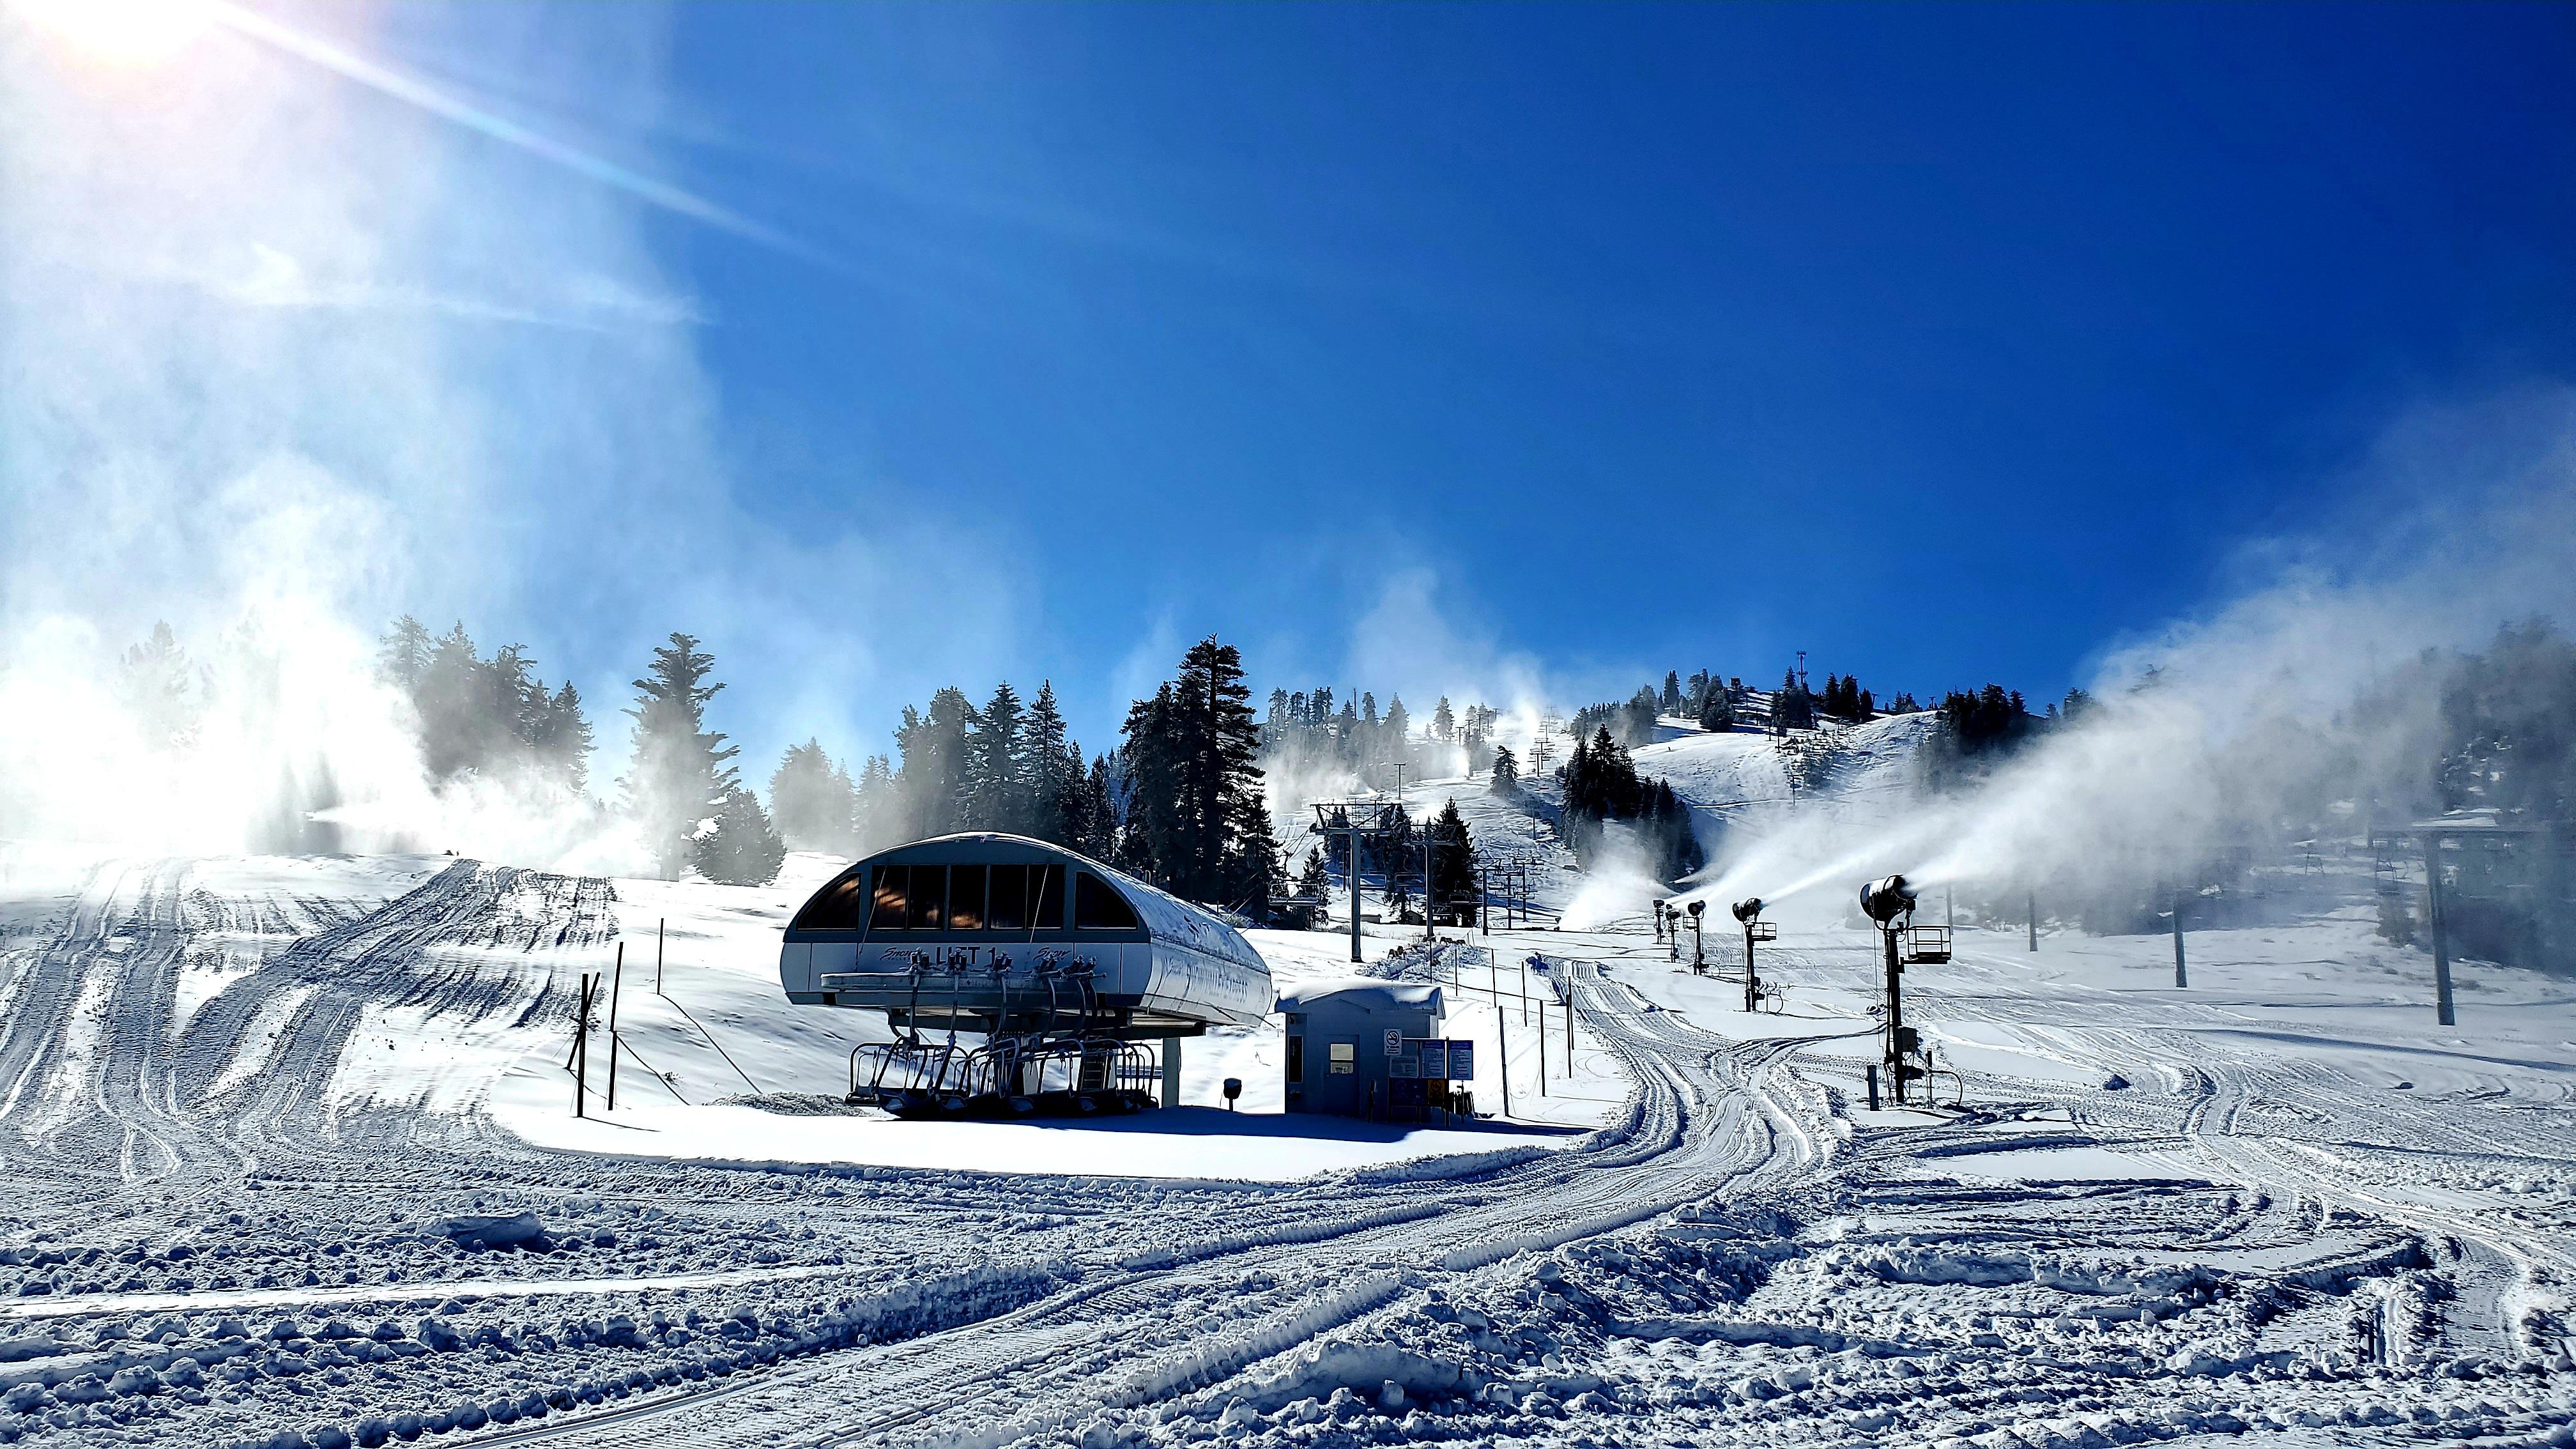 Ski Season Begins Monday at Snow Valley